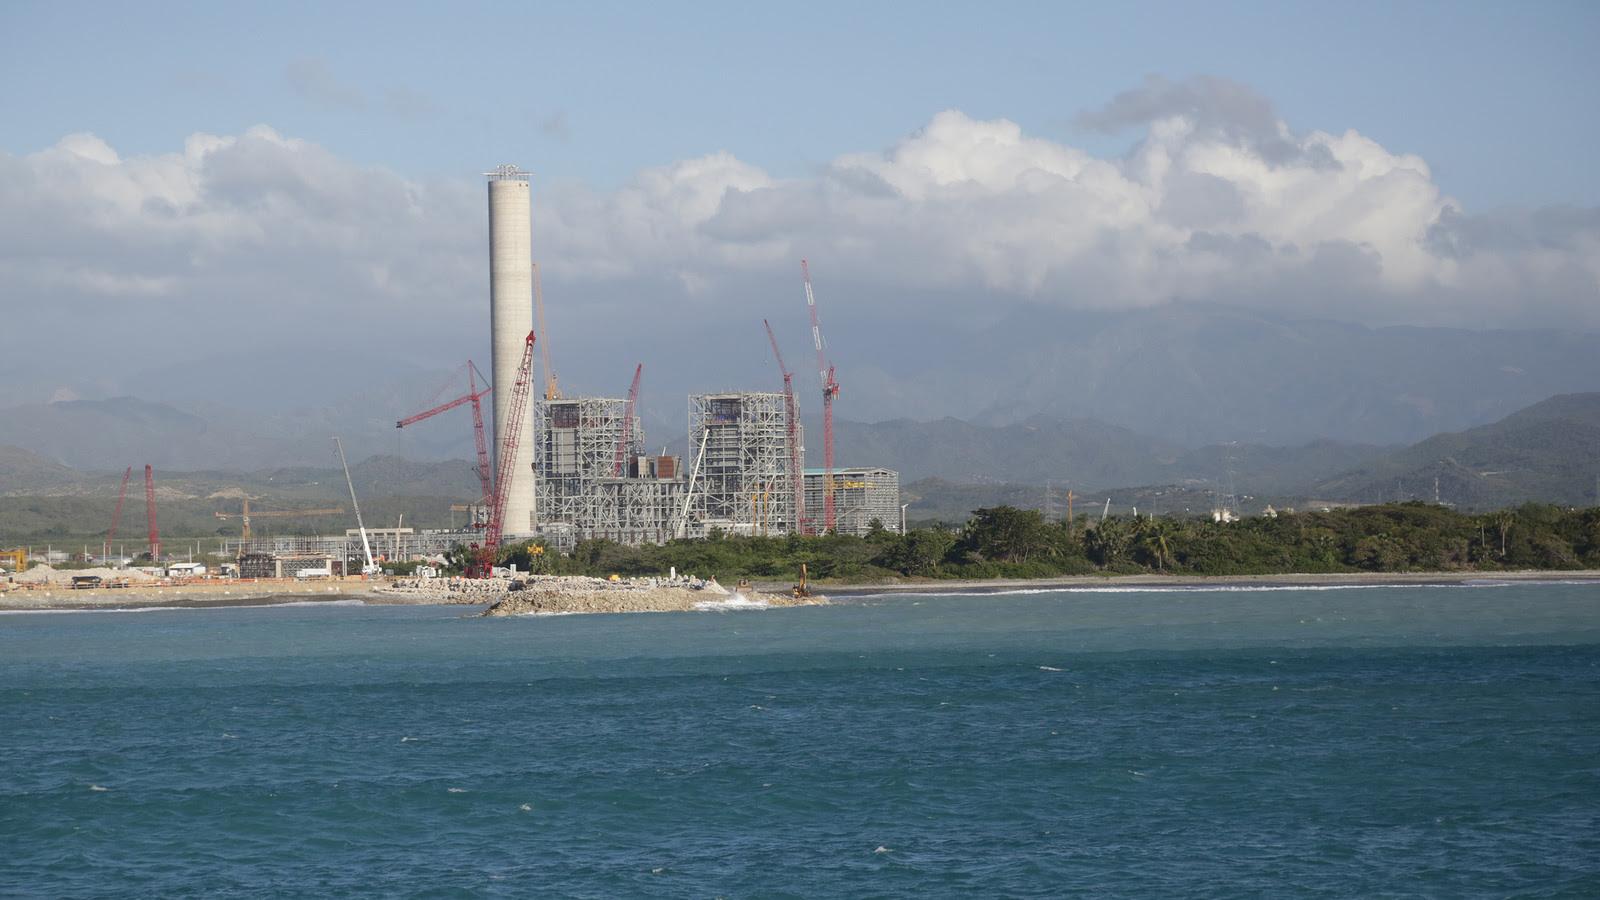 VIDEO: Punta Catalina podrá usar briquetas de basura como combustible. Uso de residuos sólidos